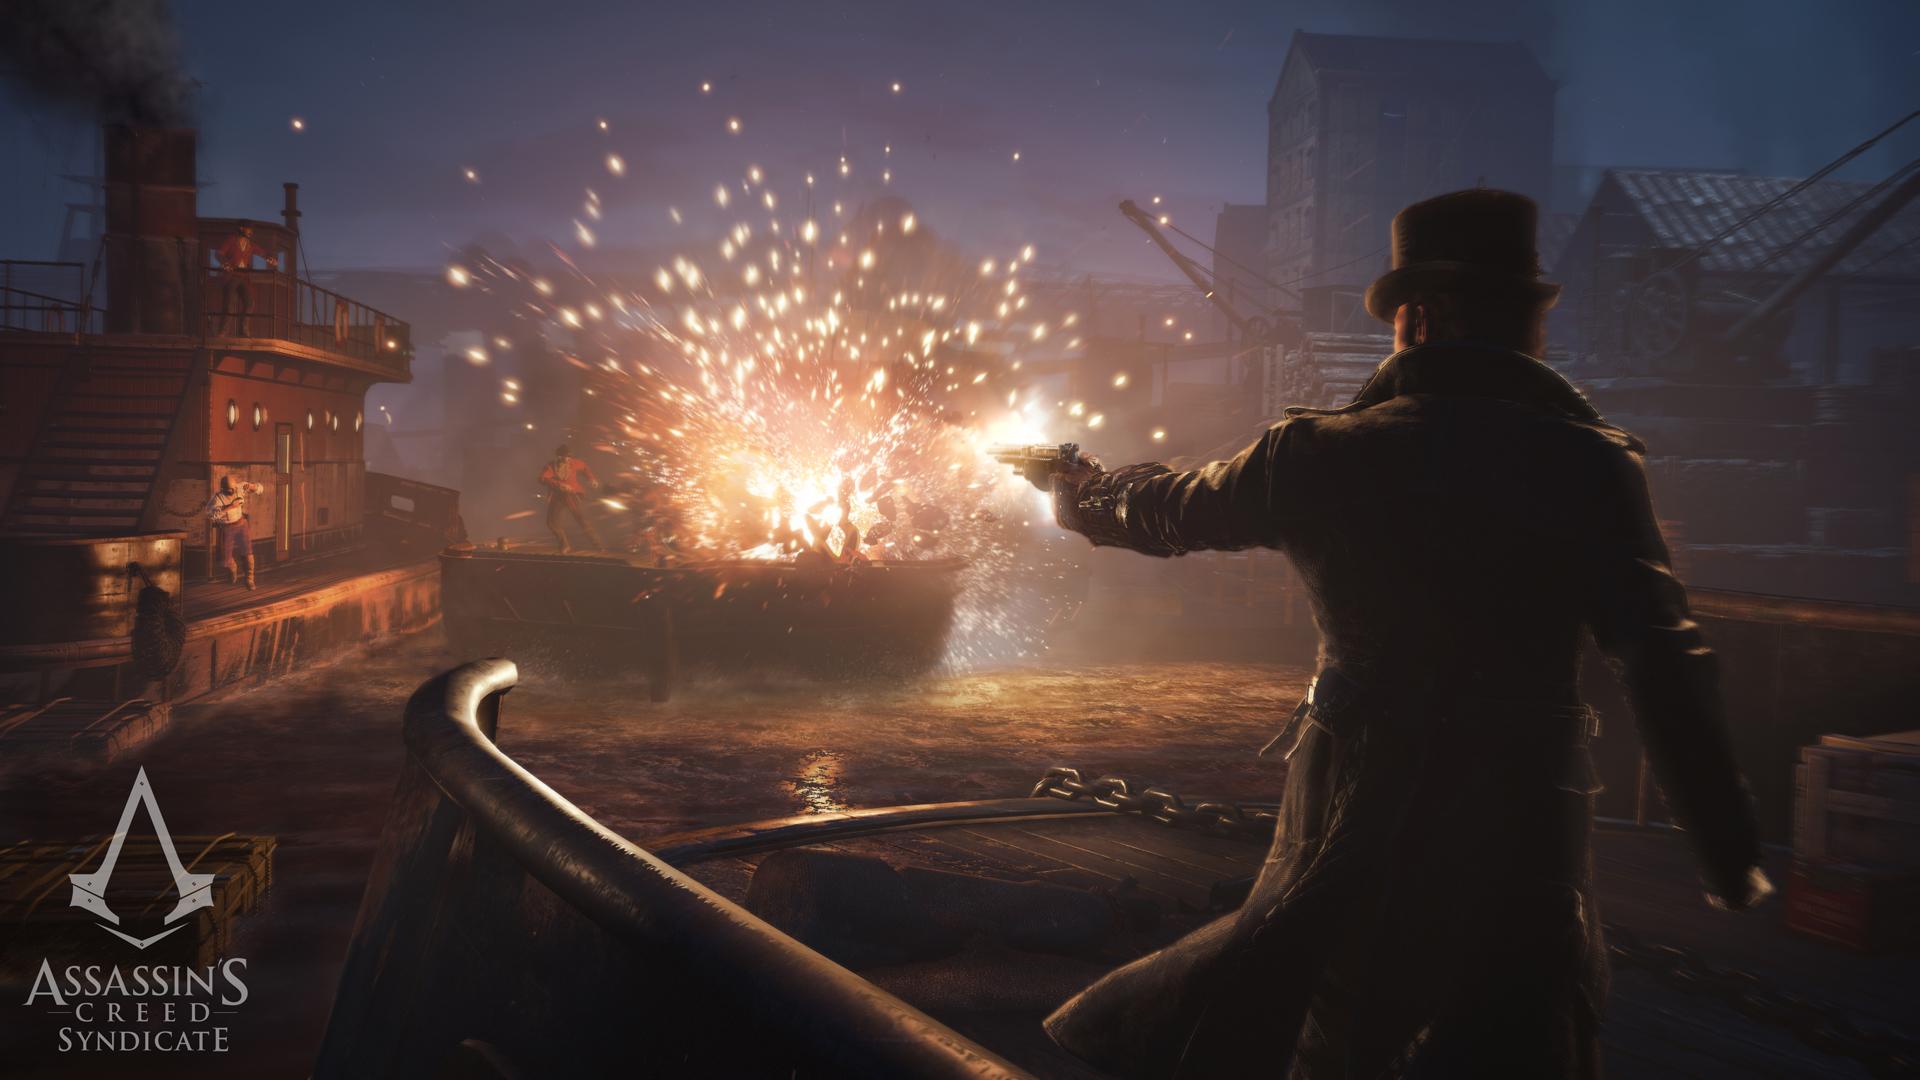 ACS_SC_27_E3_SmugglersBoatExplosion_wate